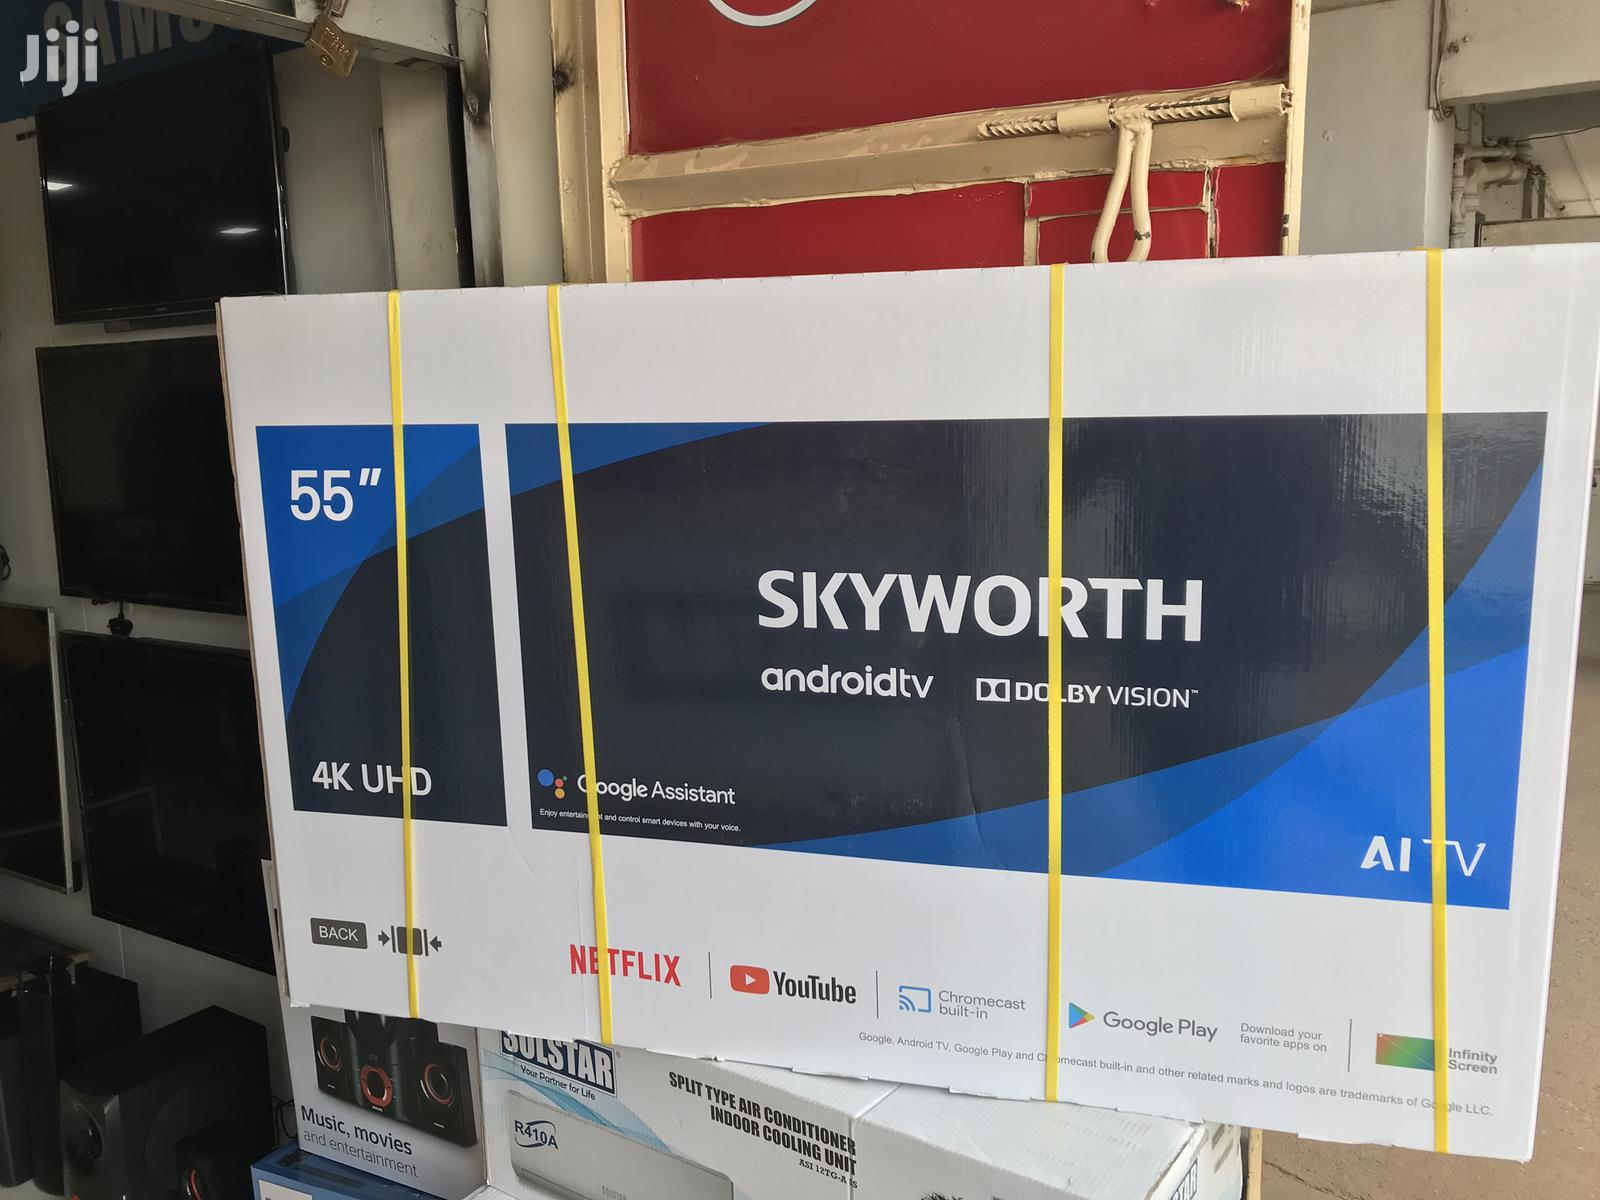 "Skyworth 55""Inches Smart Tv 4K UHD"